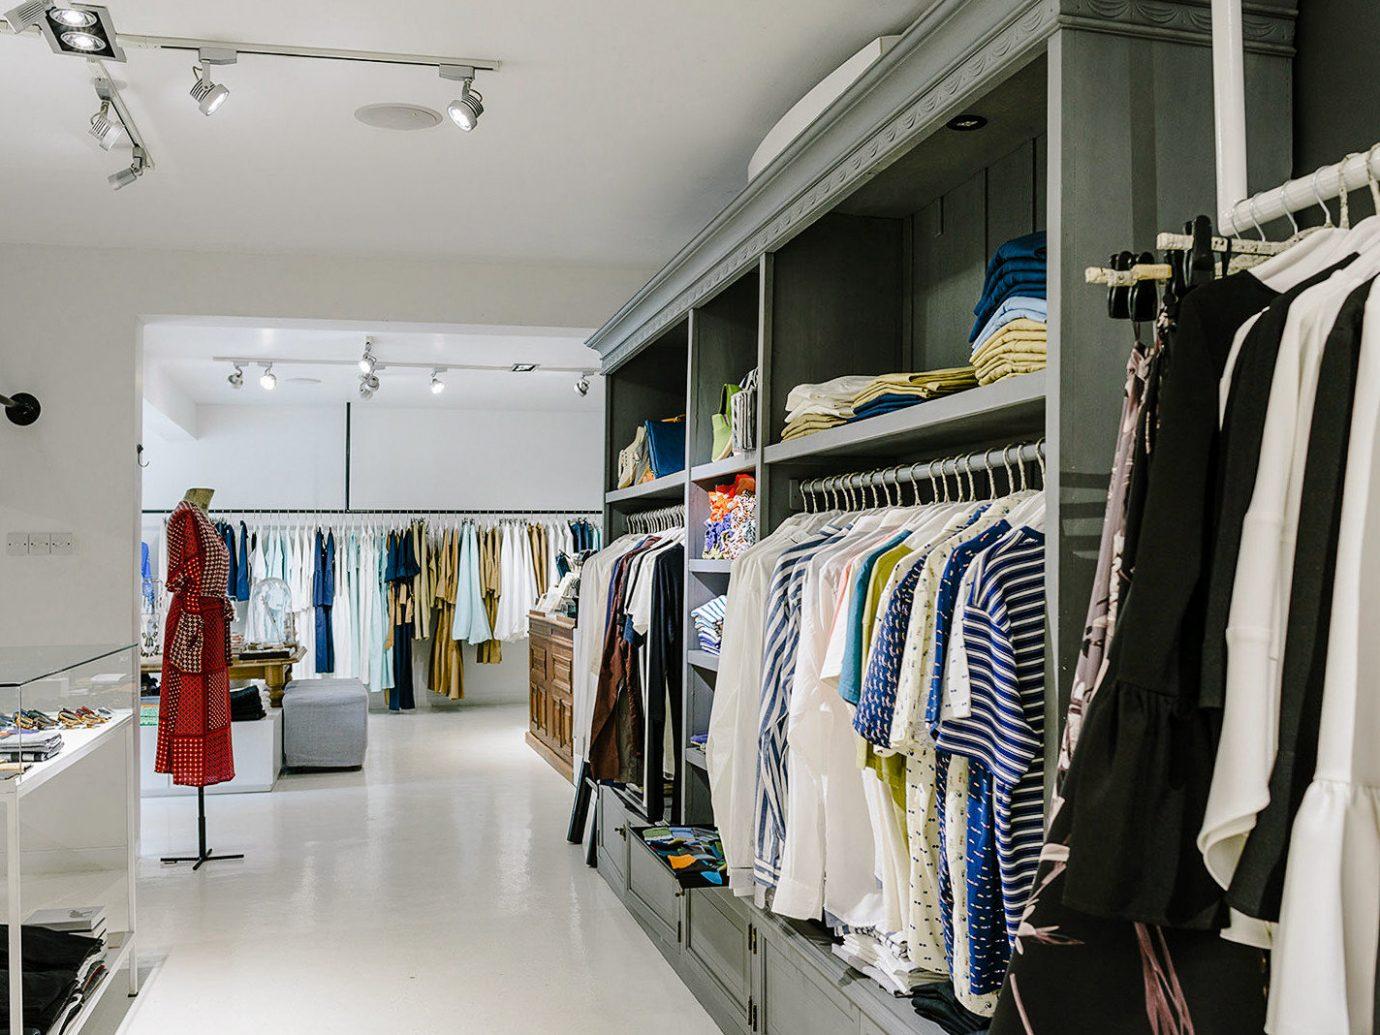 indoor Boutique retail closet interior design outlet store rack several